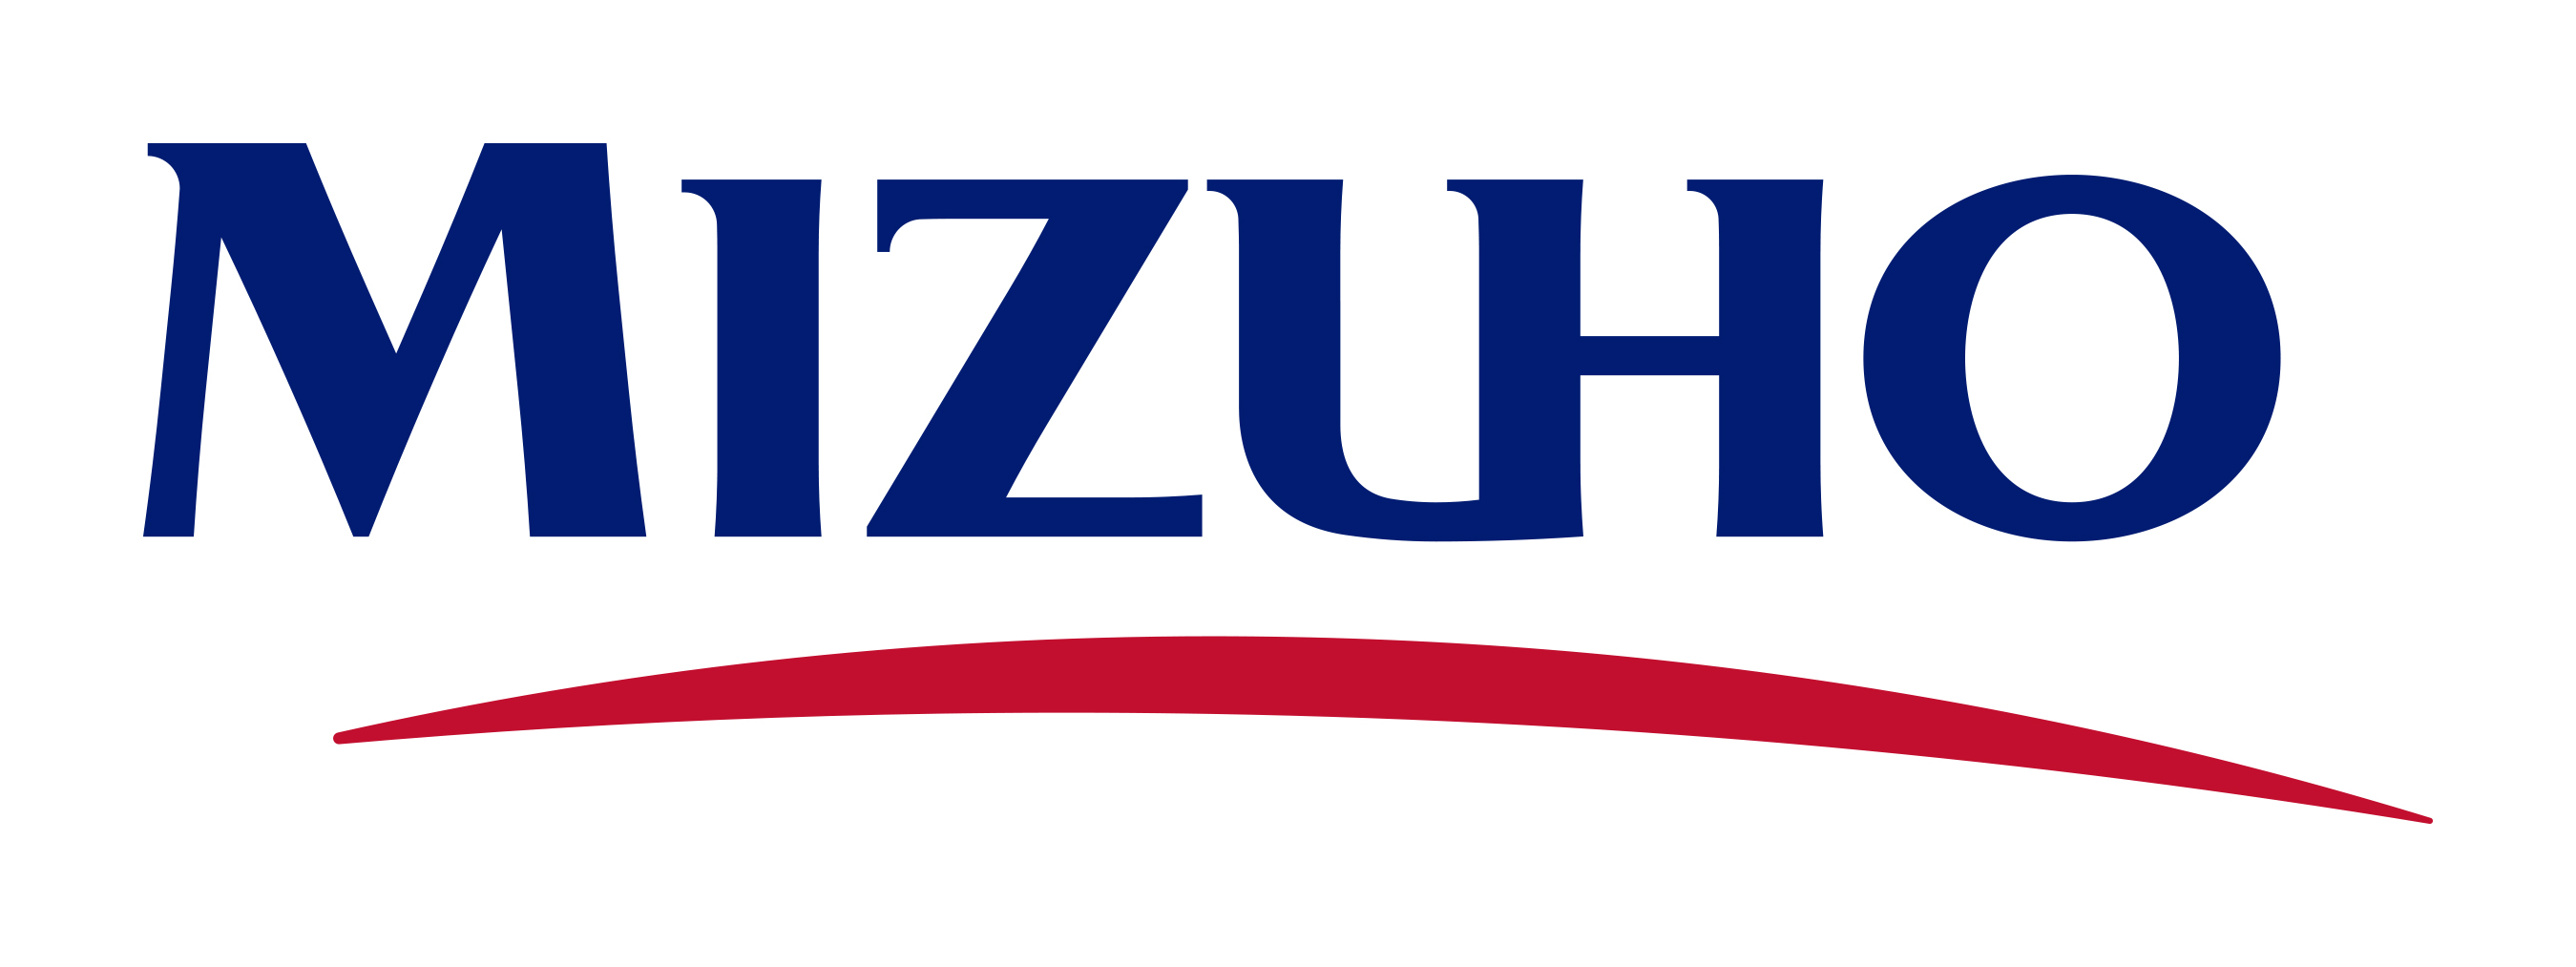 Mizuho Bank, Ltd